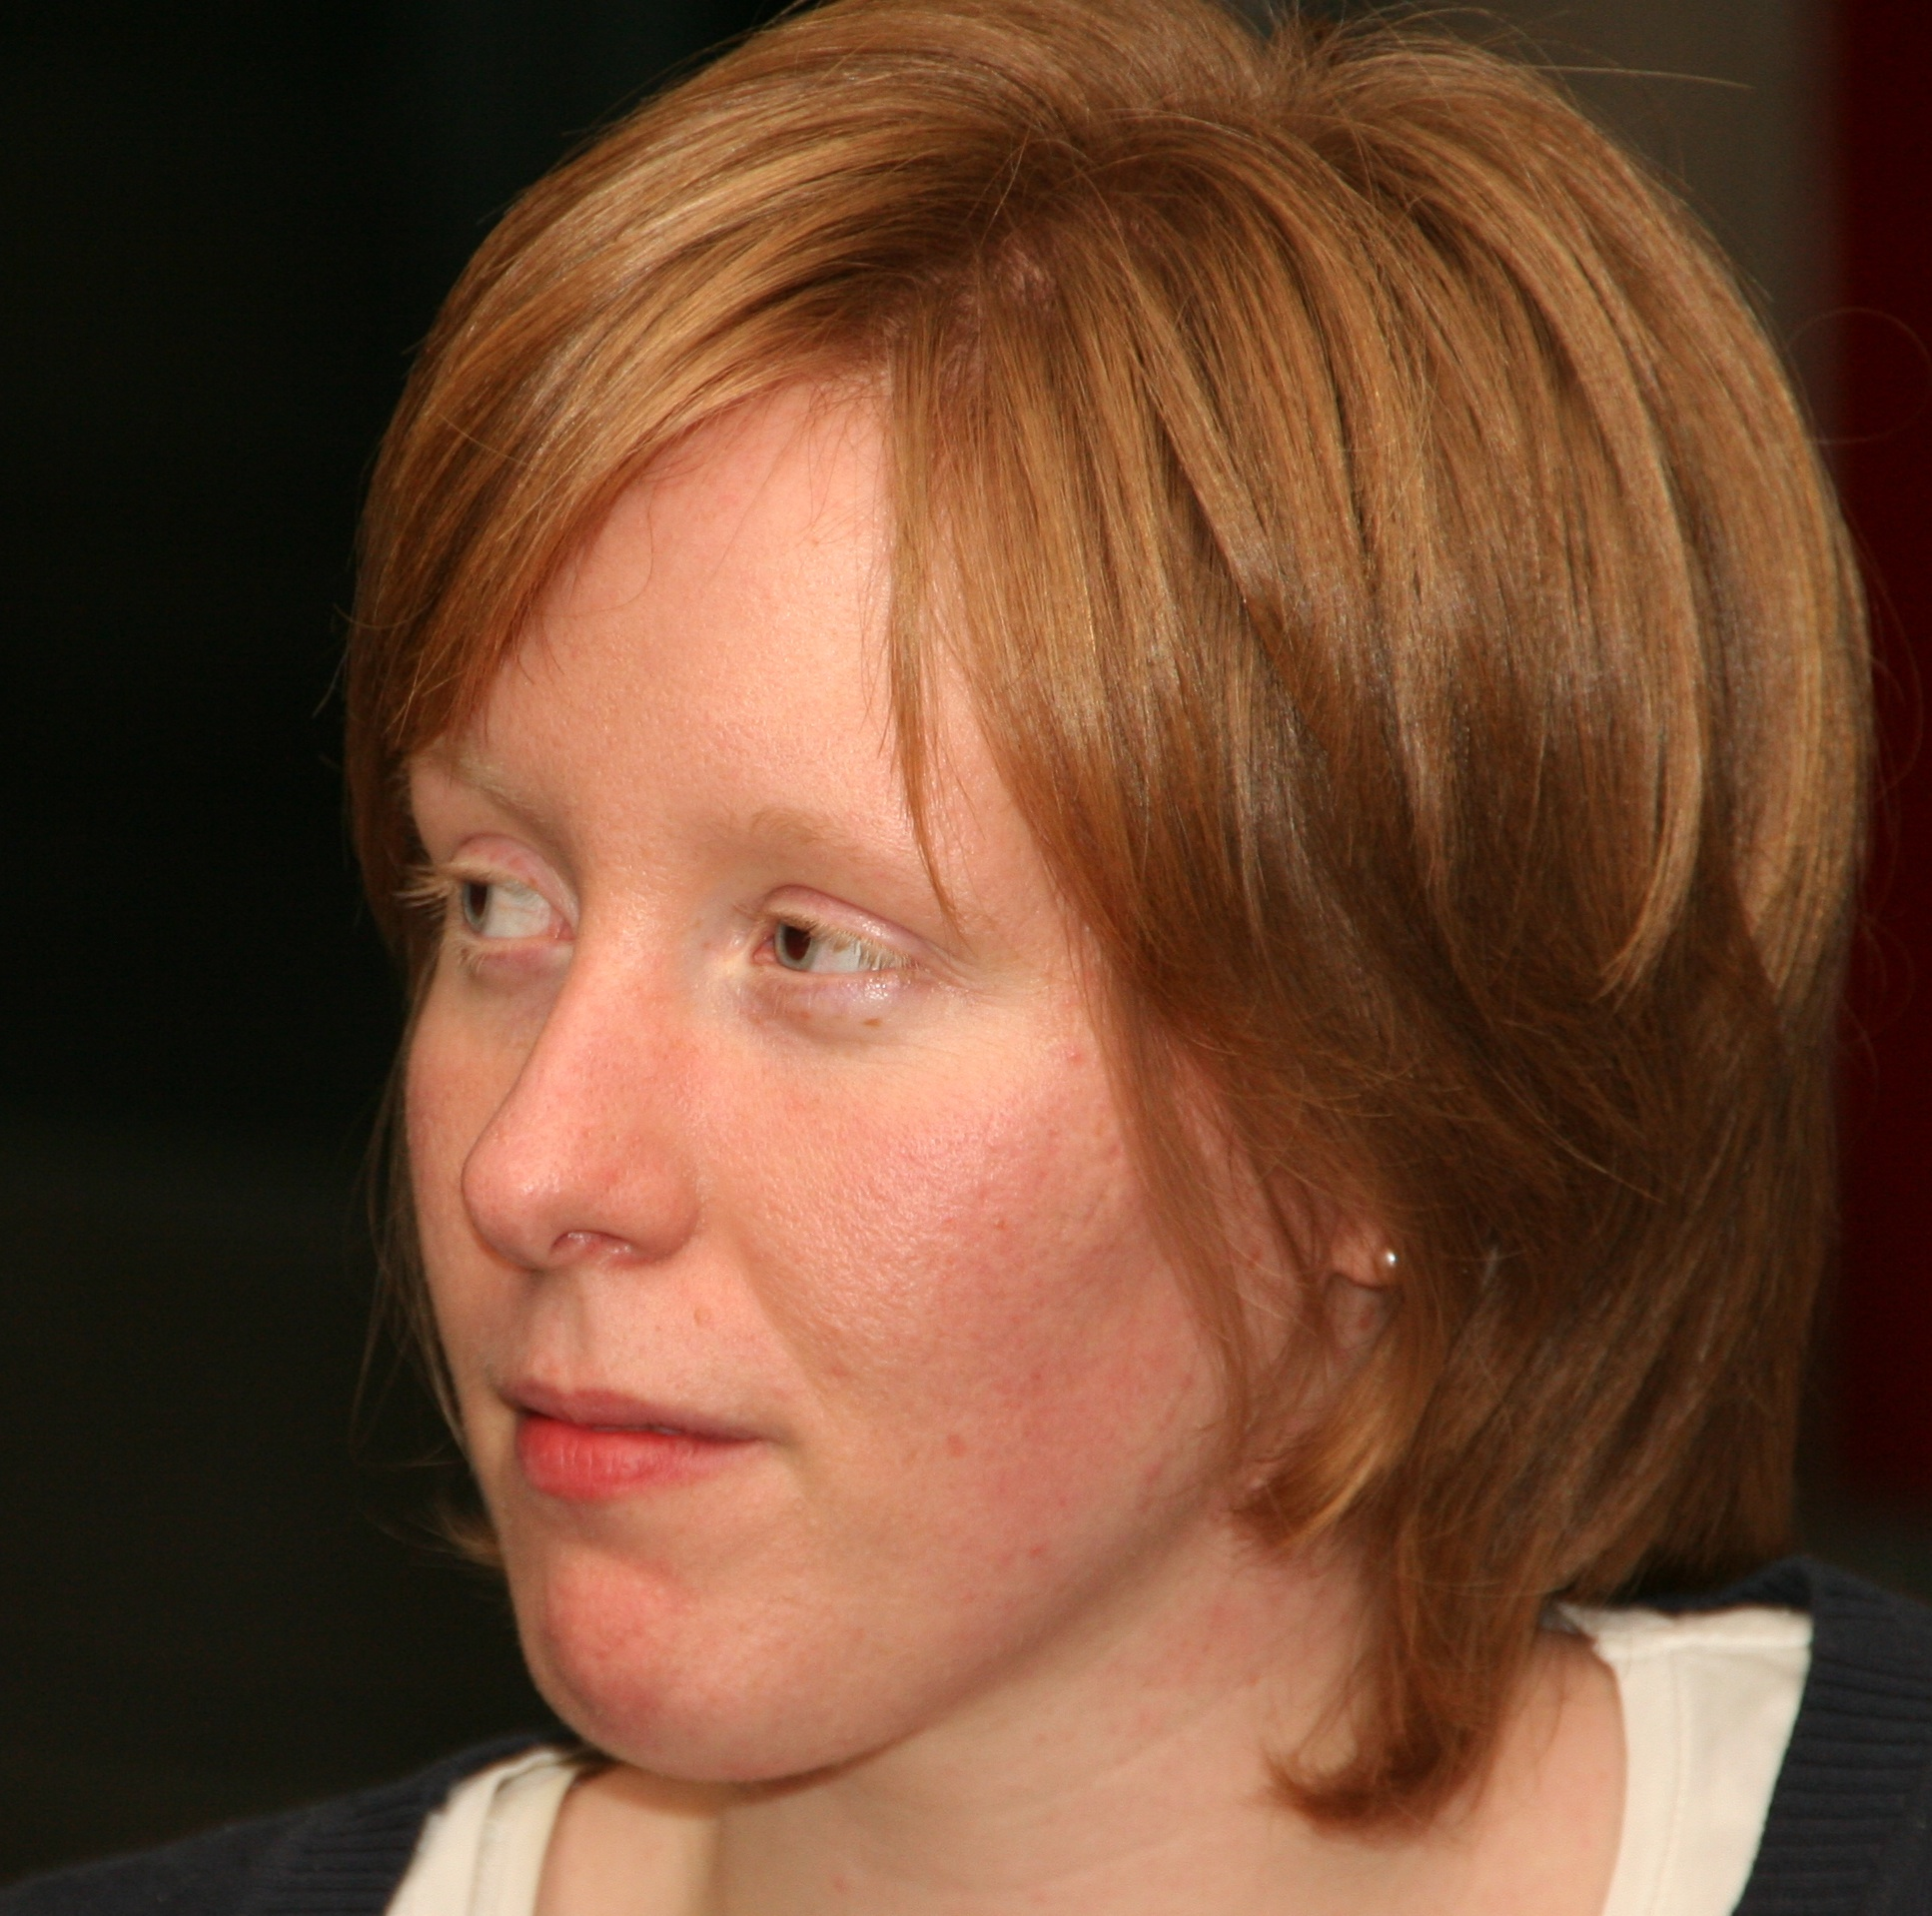 Livia, Petermann